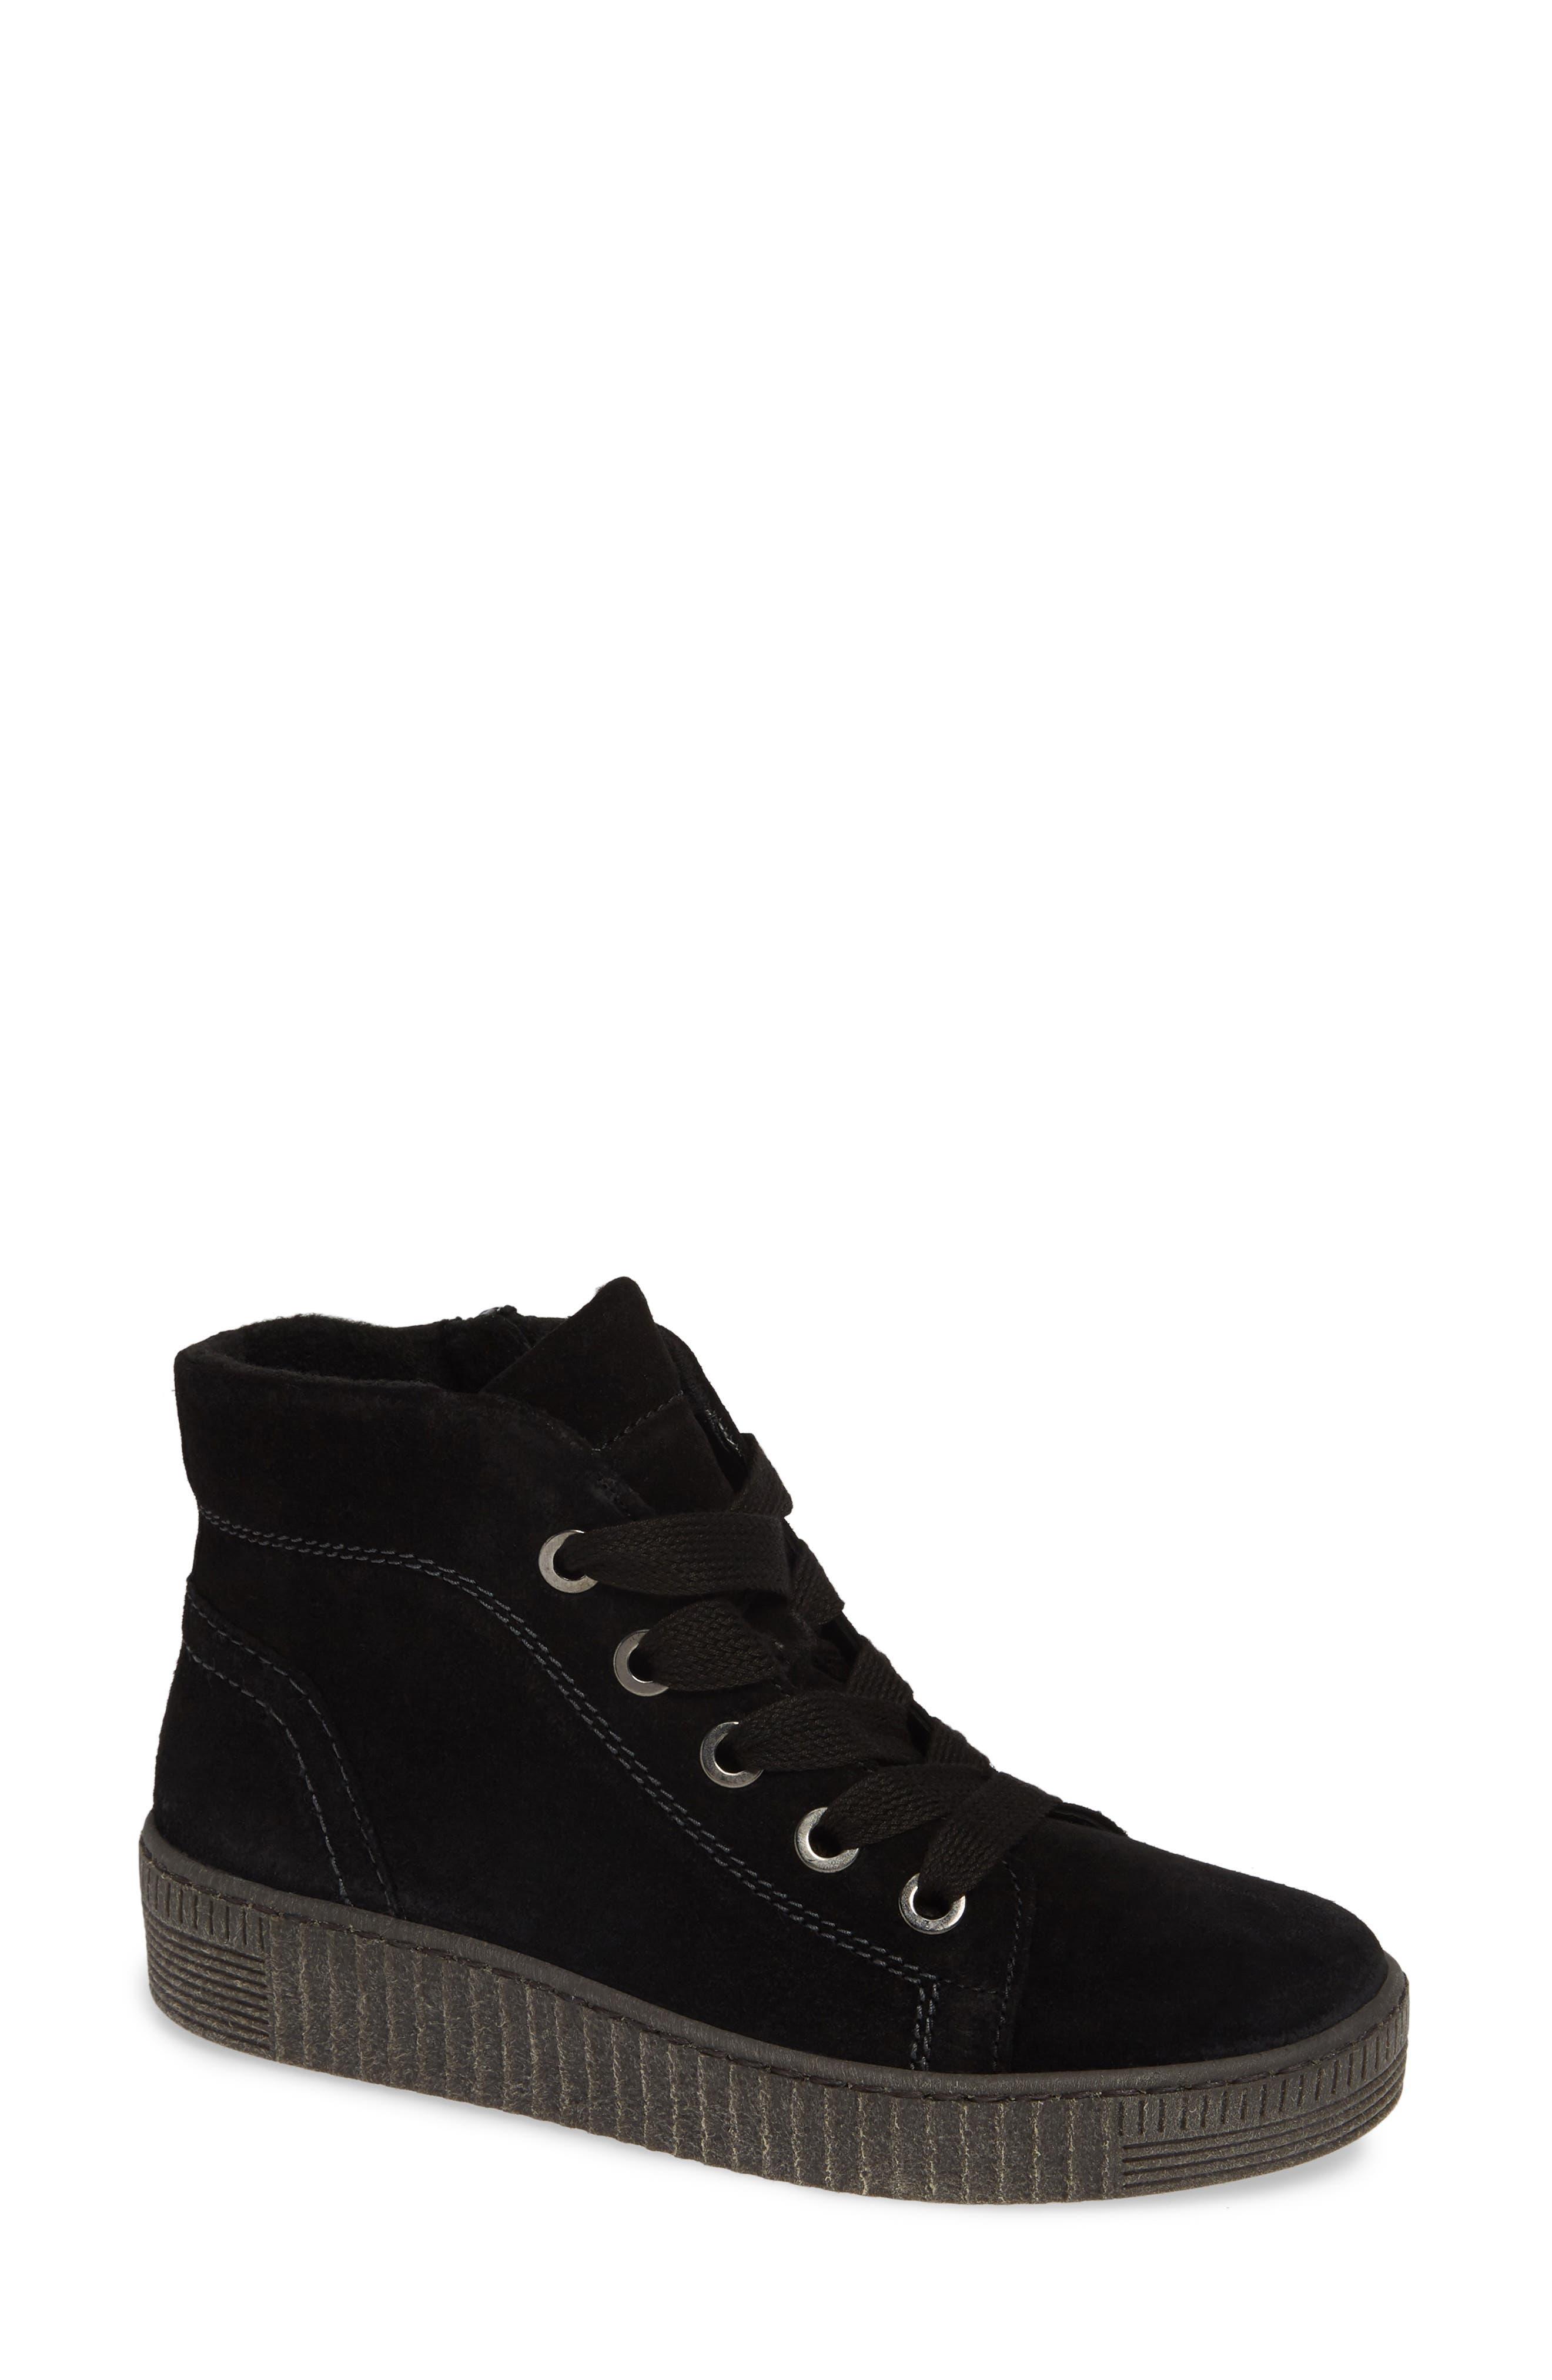 Gabor High Top Sneaker- Black